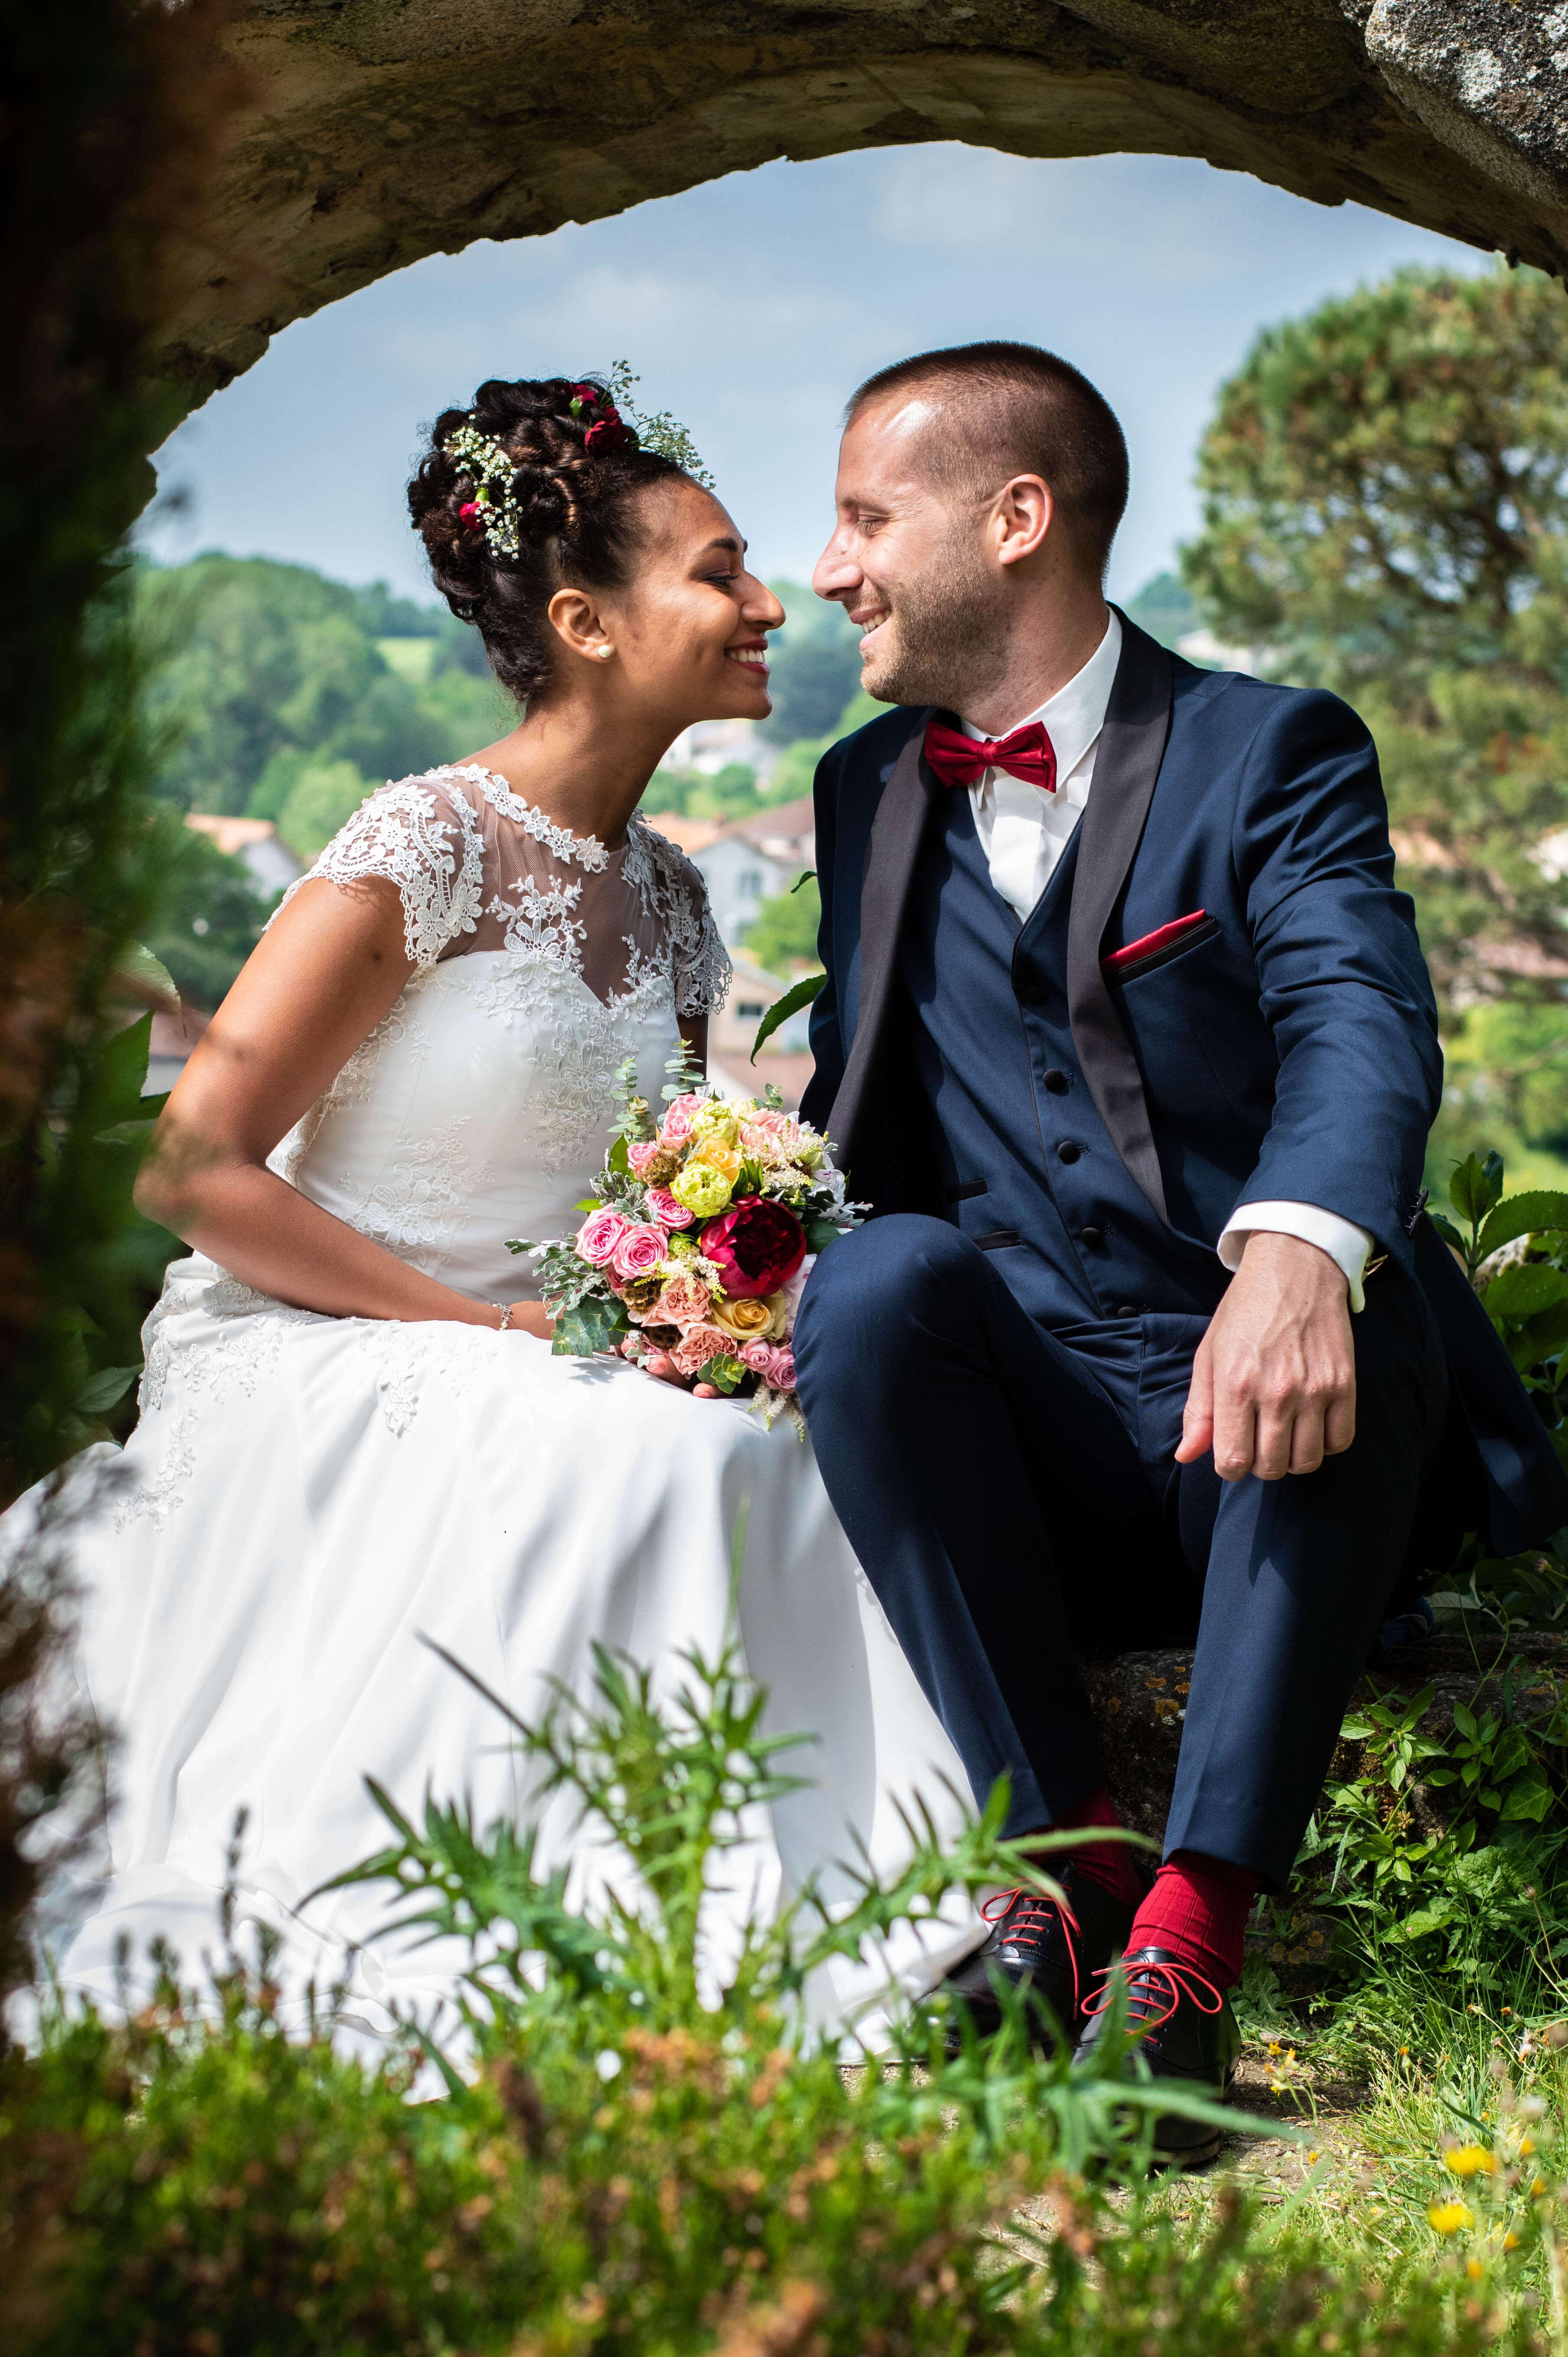 photographe mariage nantes -8